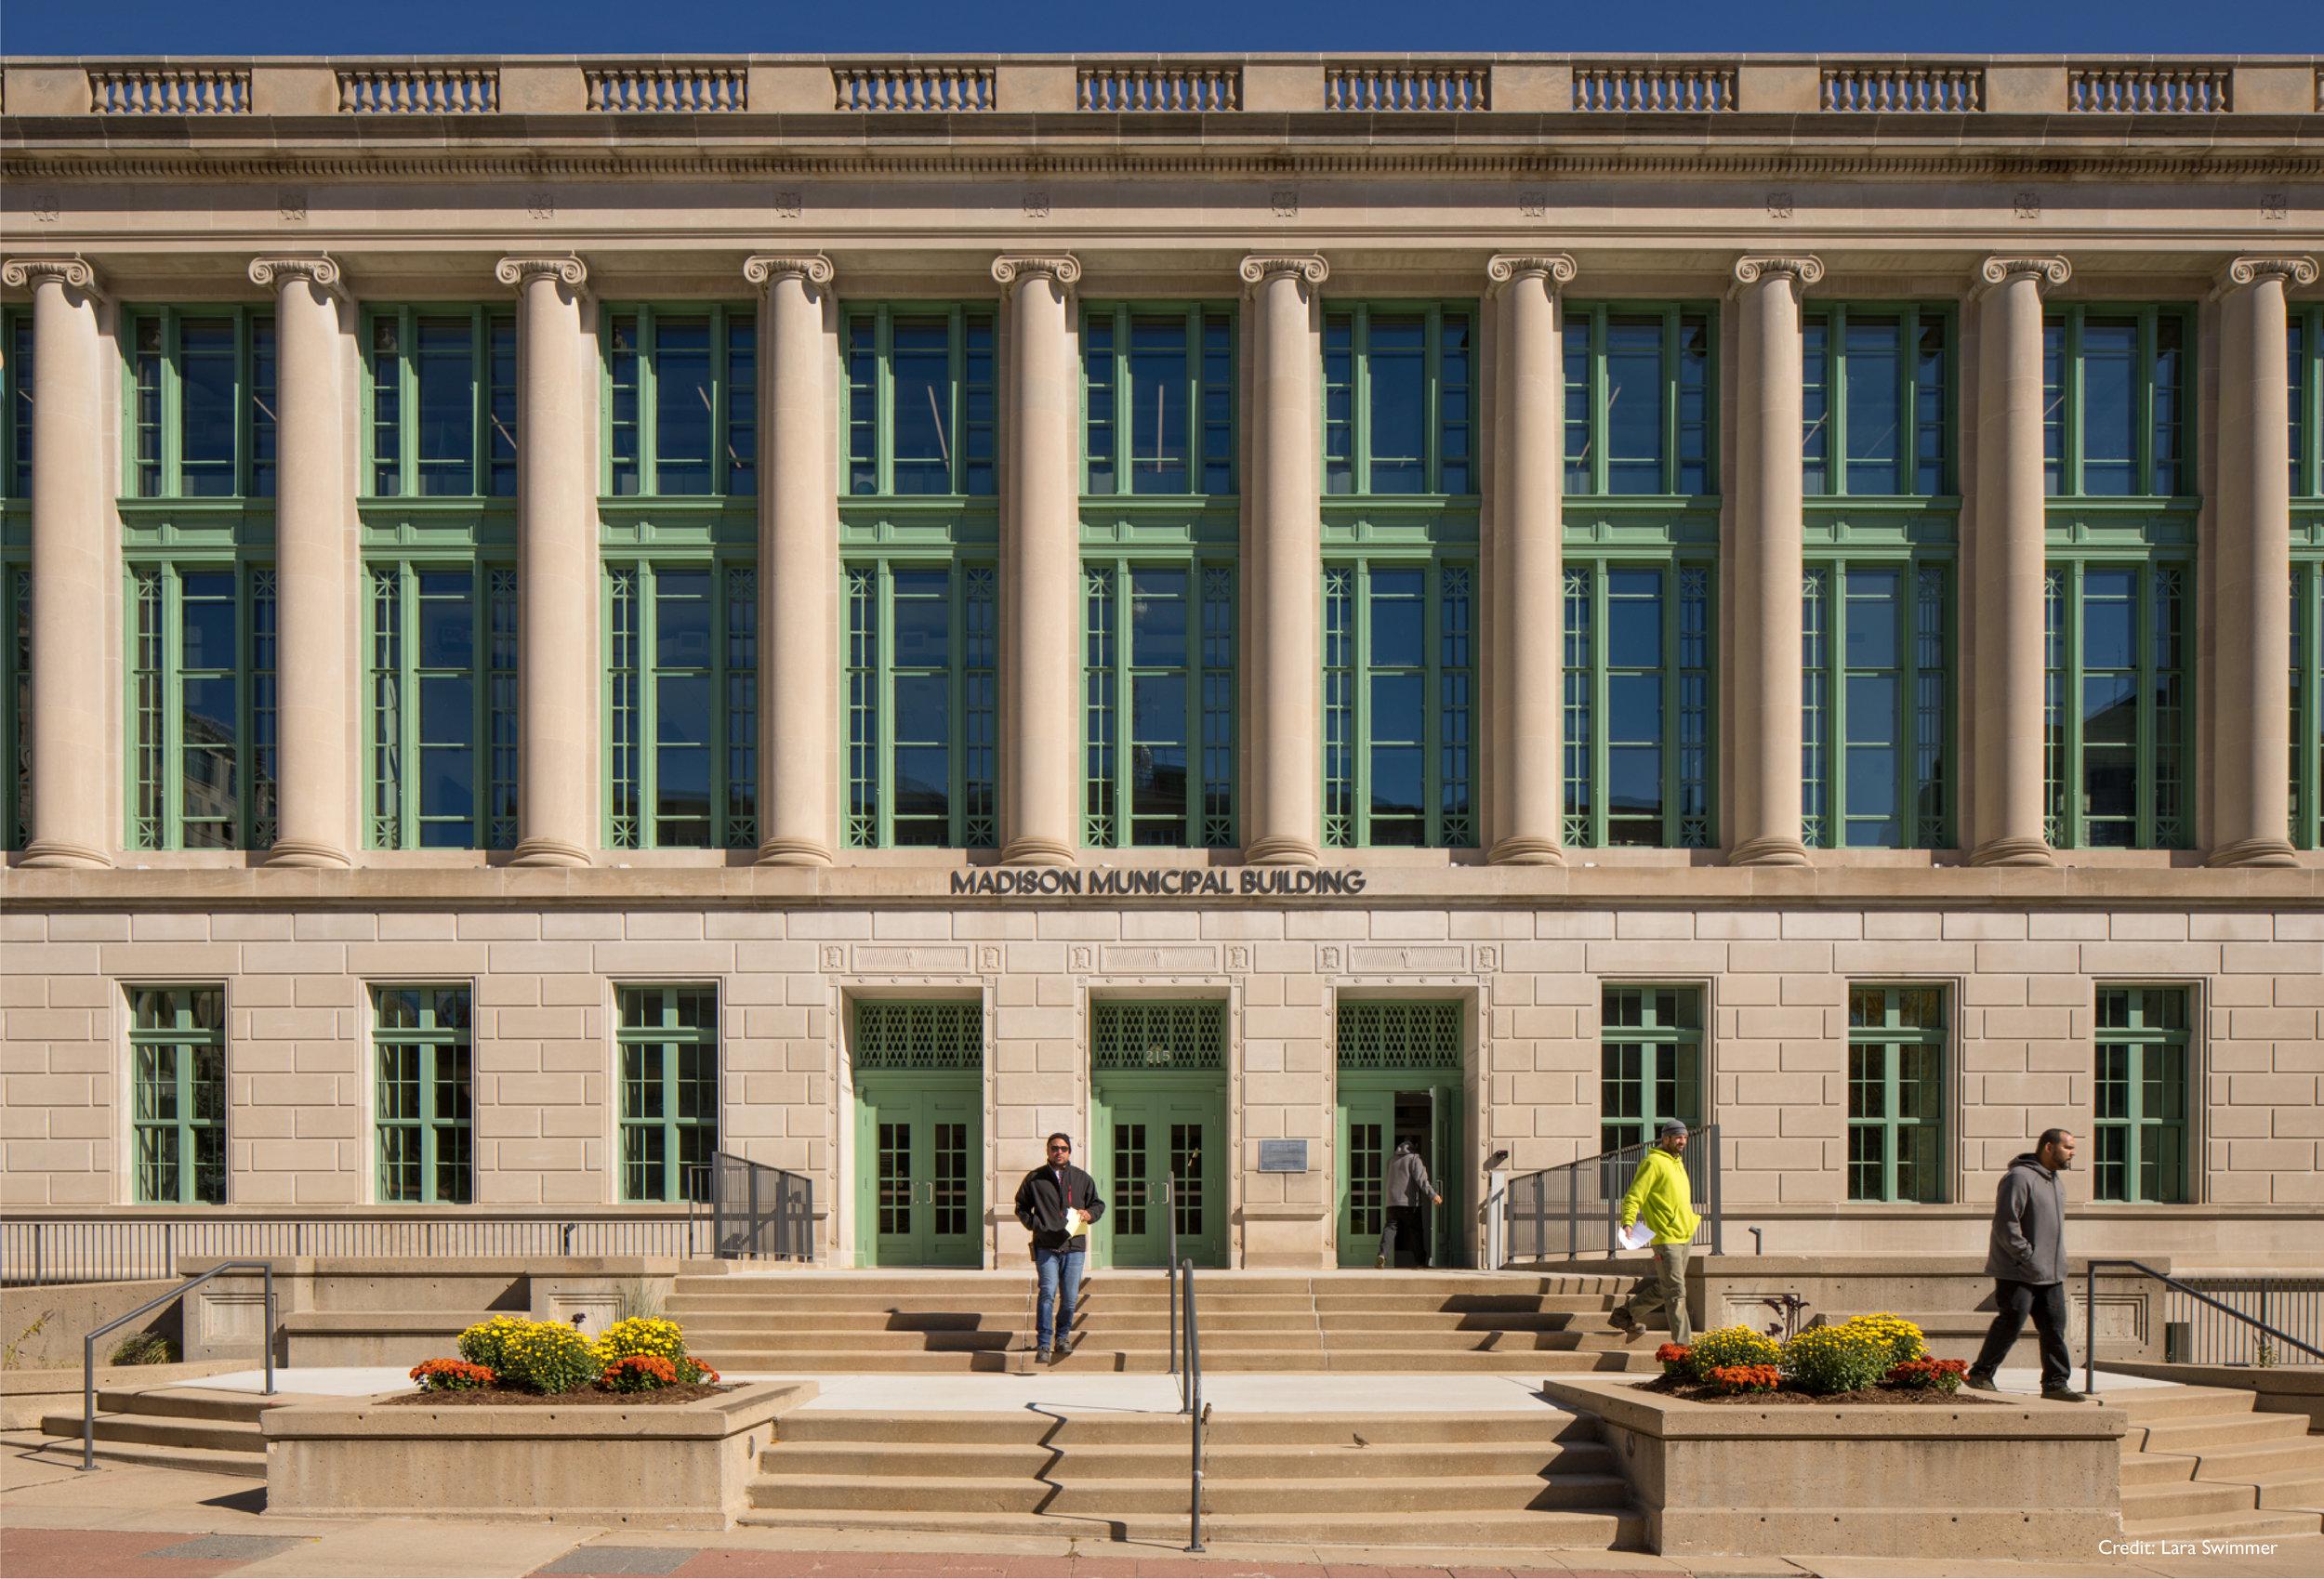 Photo of the Madison Municipal Building by Lara Swimmer